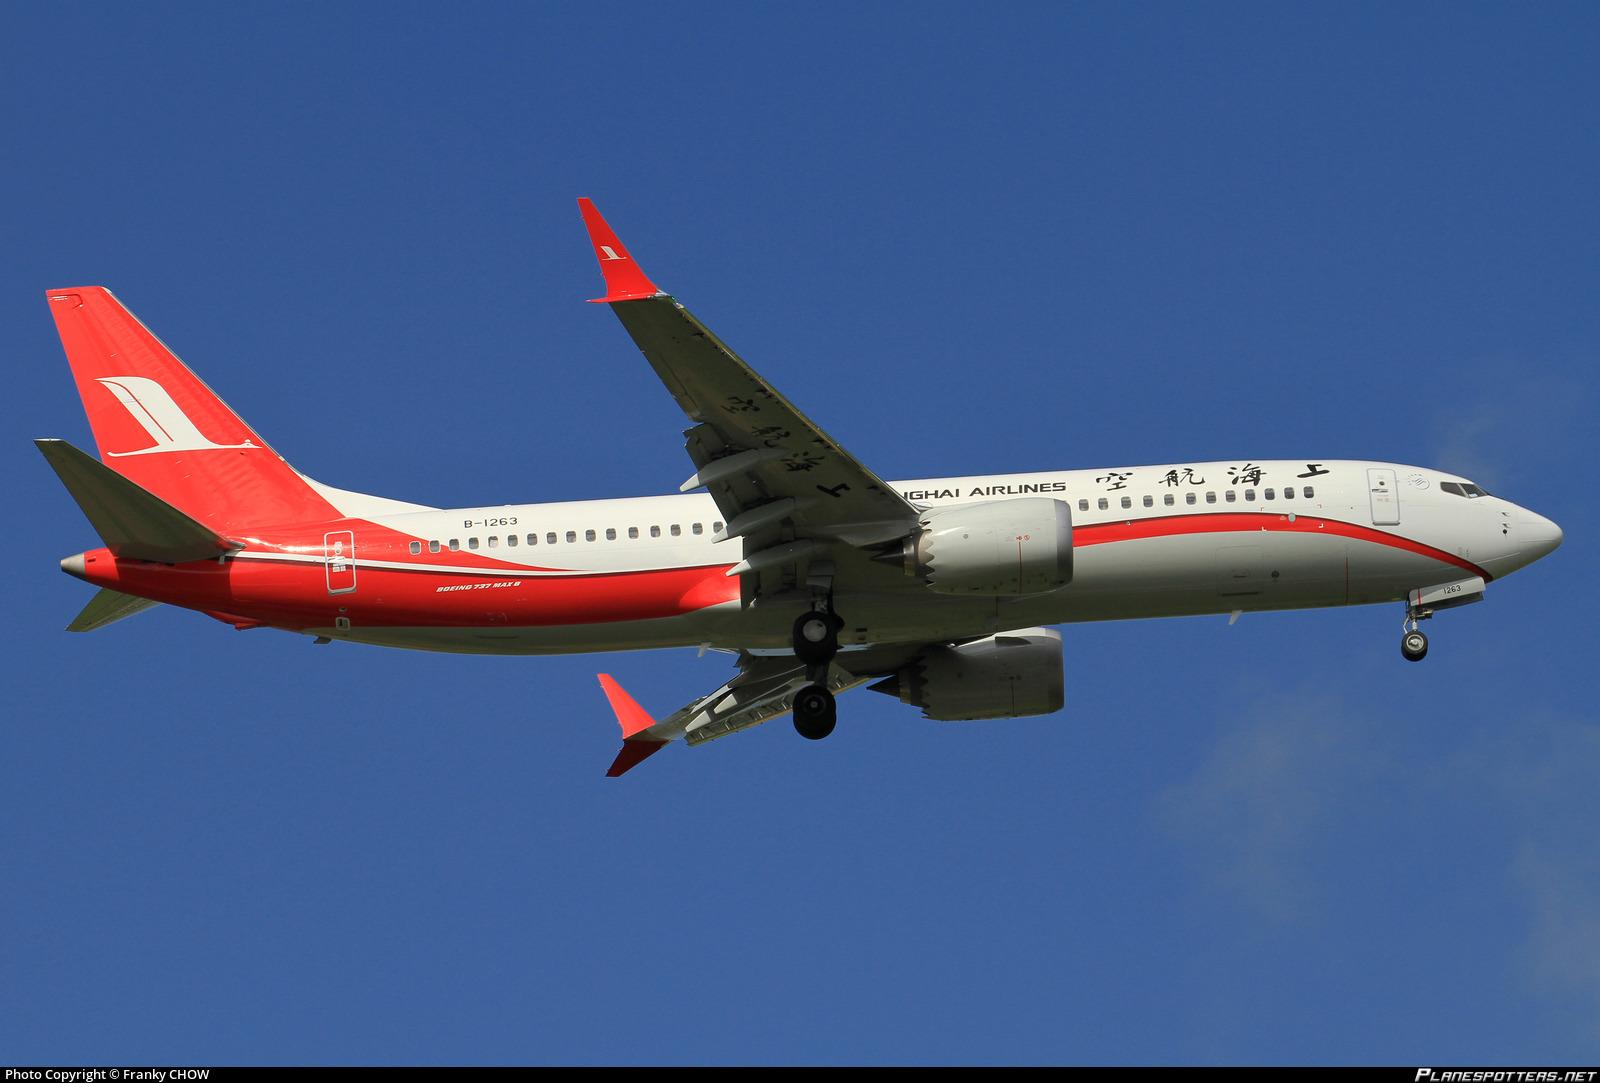 B-1263 Shanghai Airlines Boeing 737-8 MAX